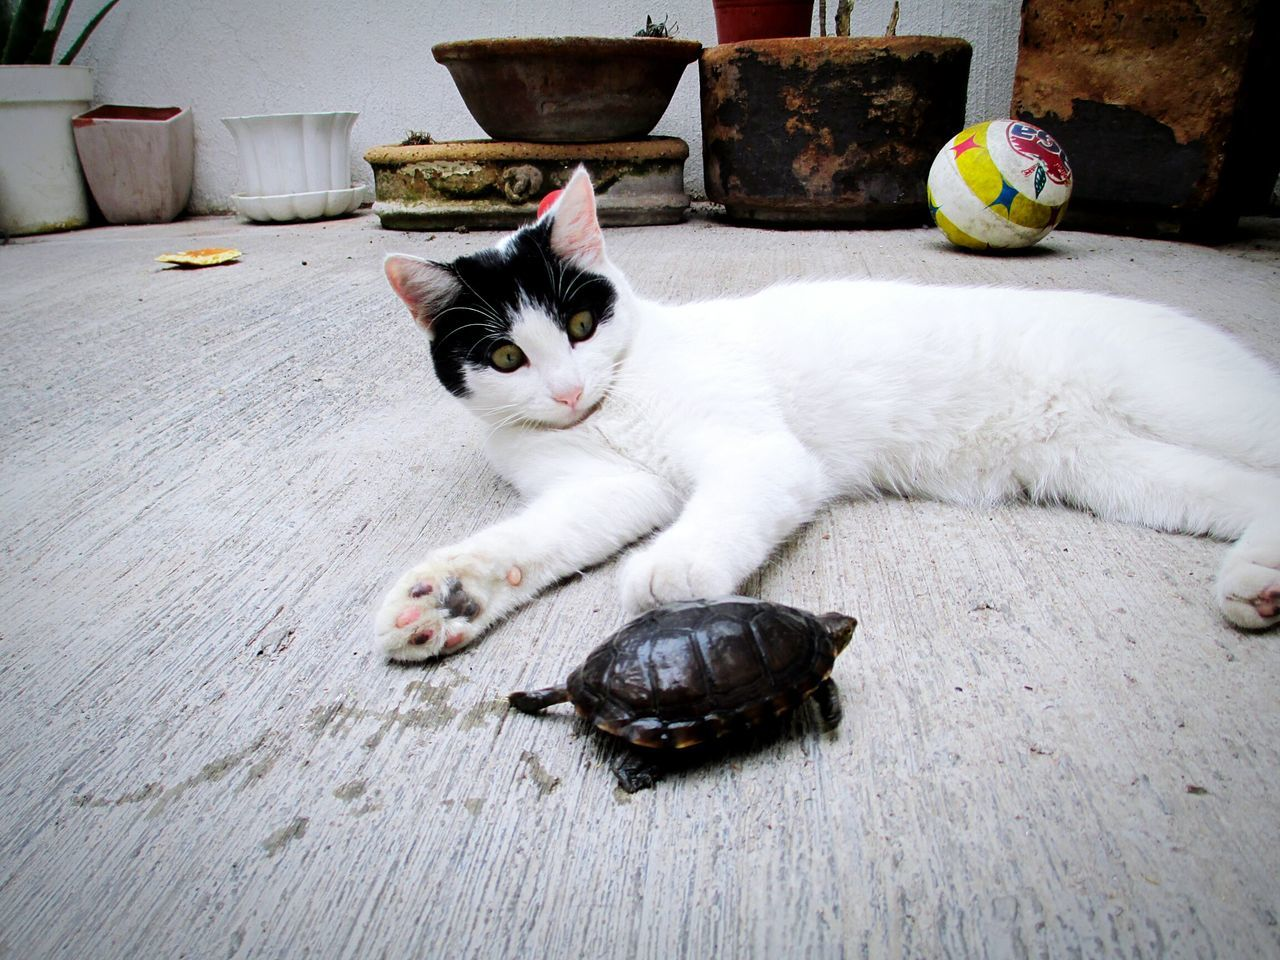 Cat Relaxing By Tortoise On Floor